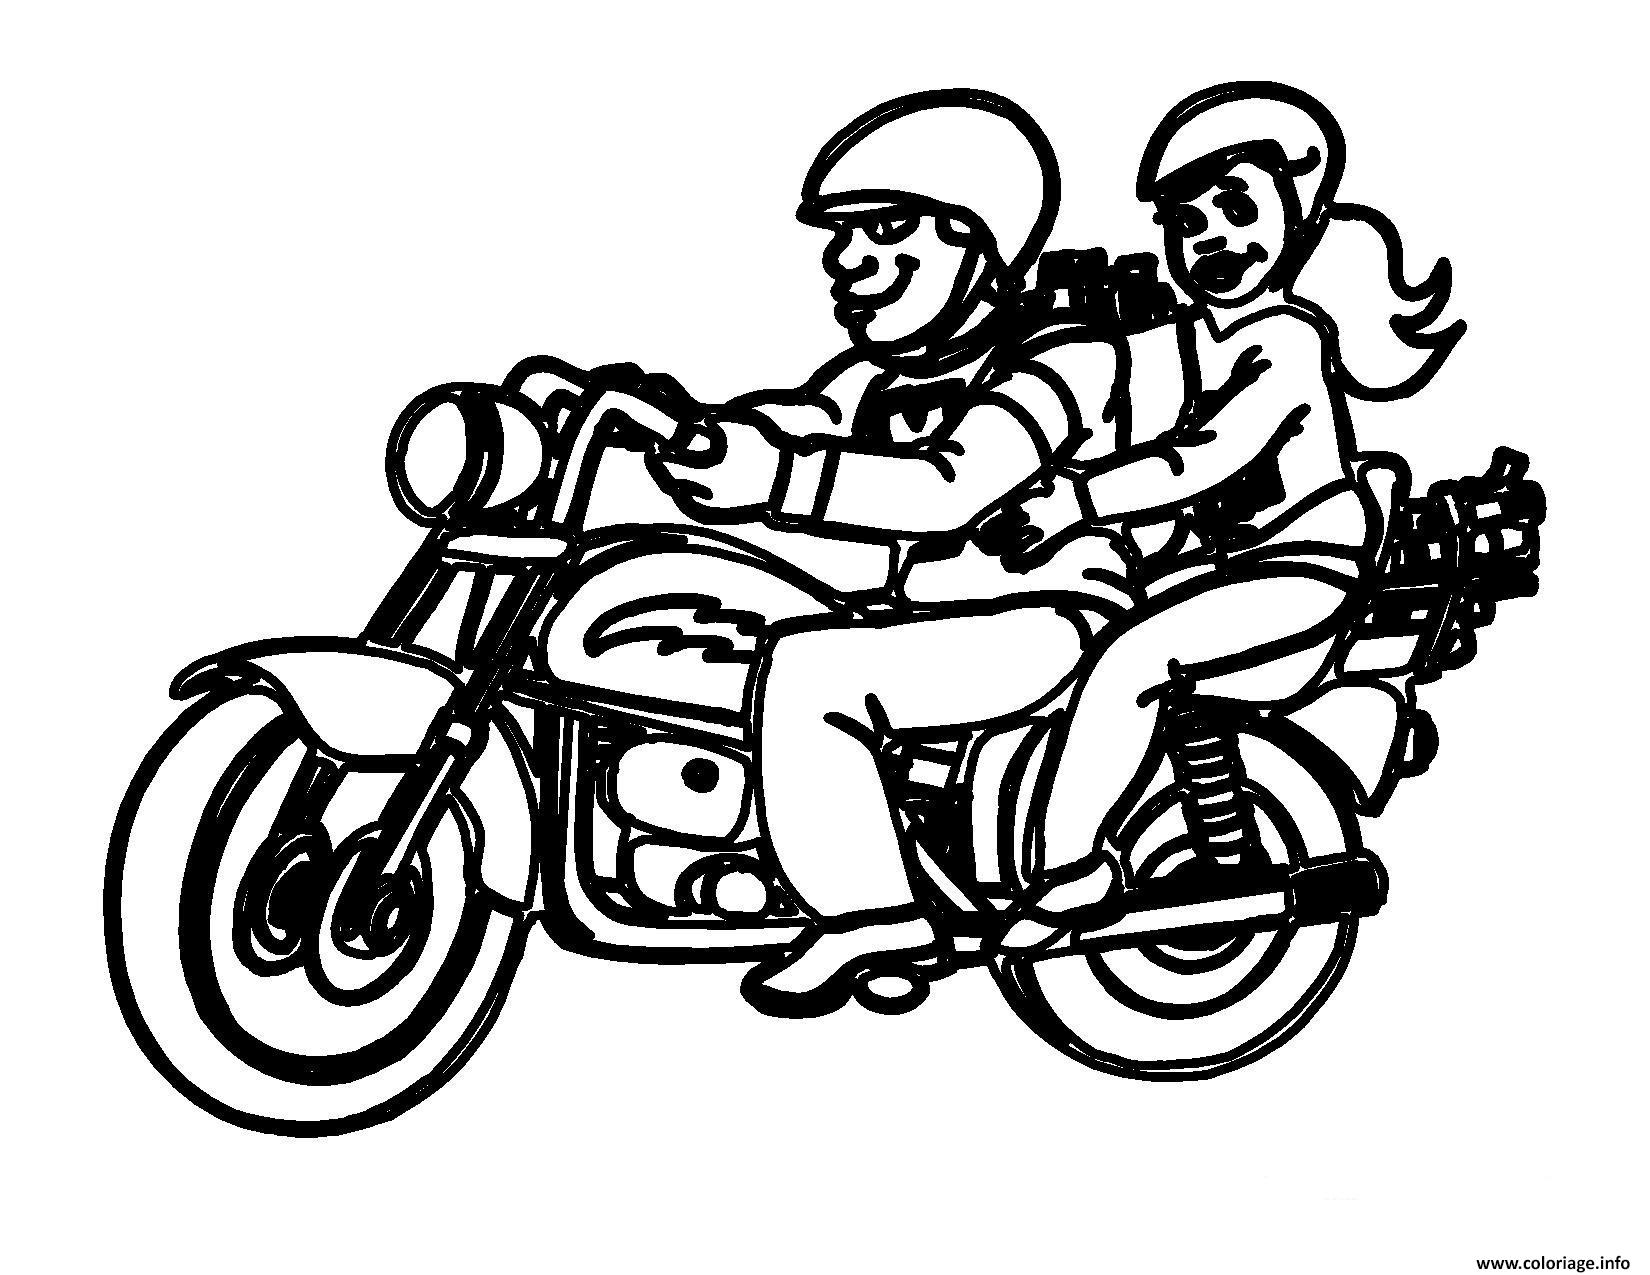 Coloriage motocyclette 8 dessin - Dessin moto simple ...